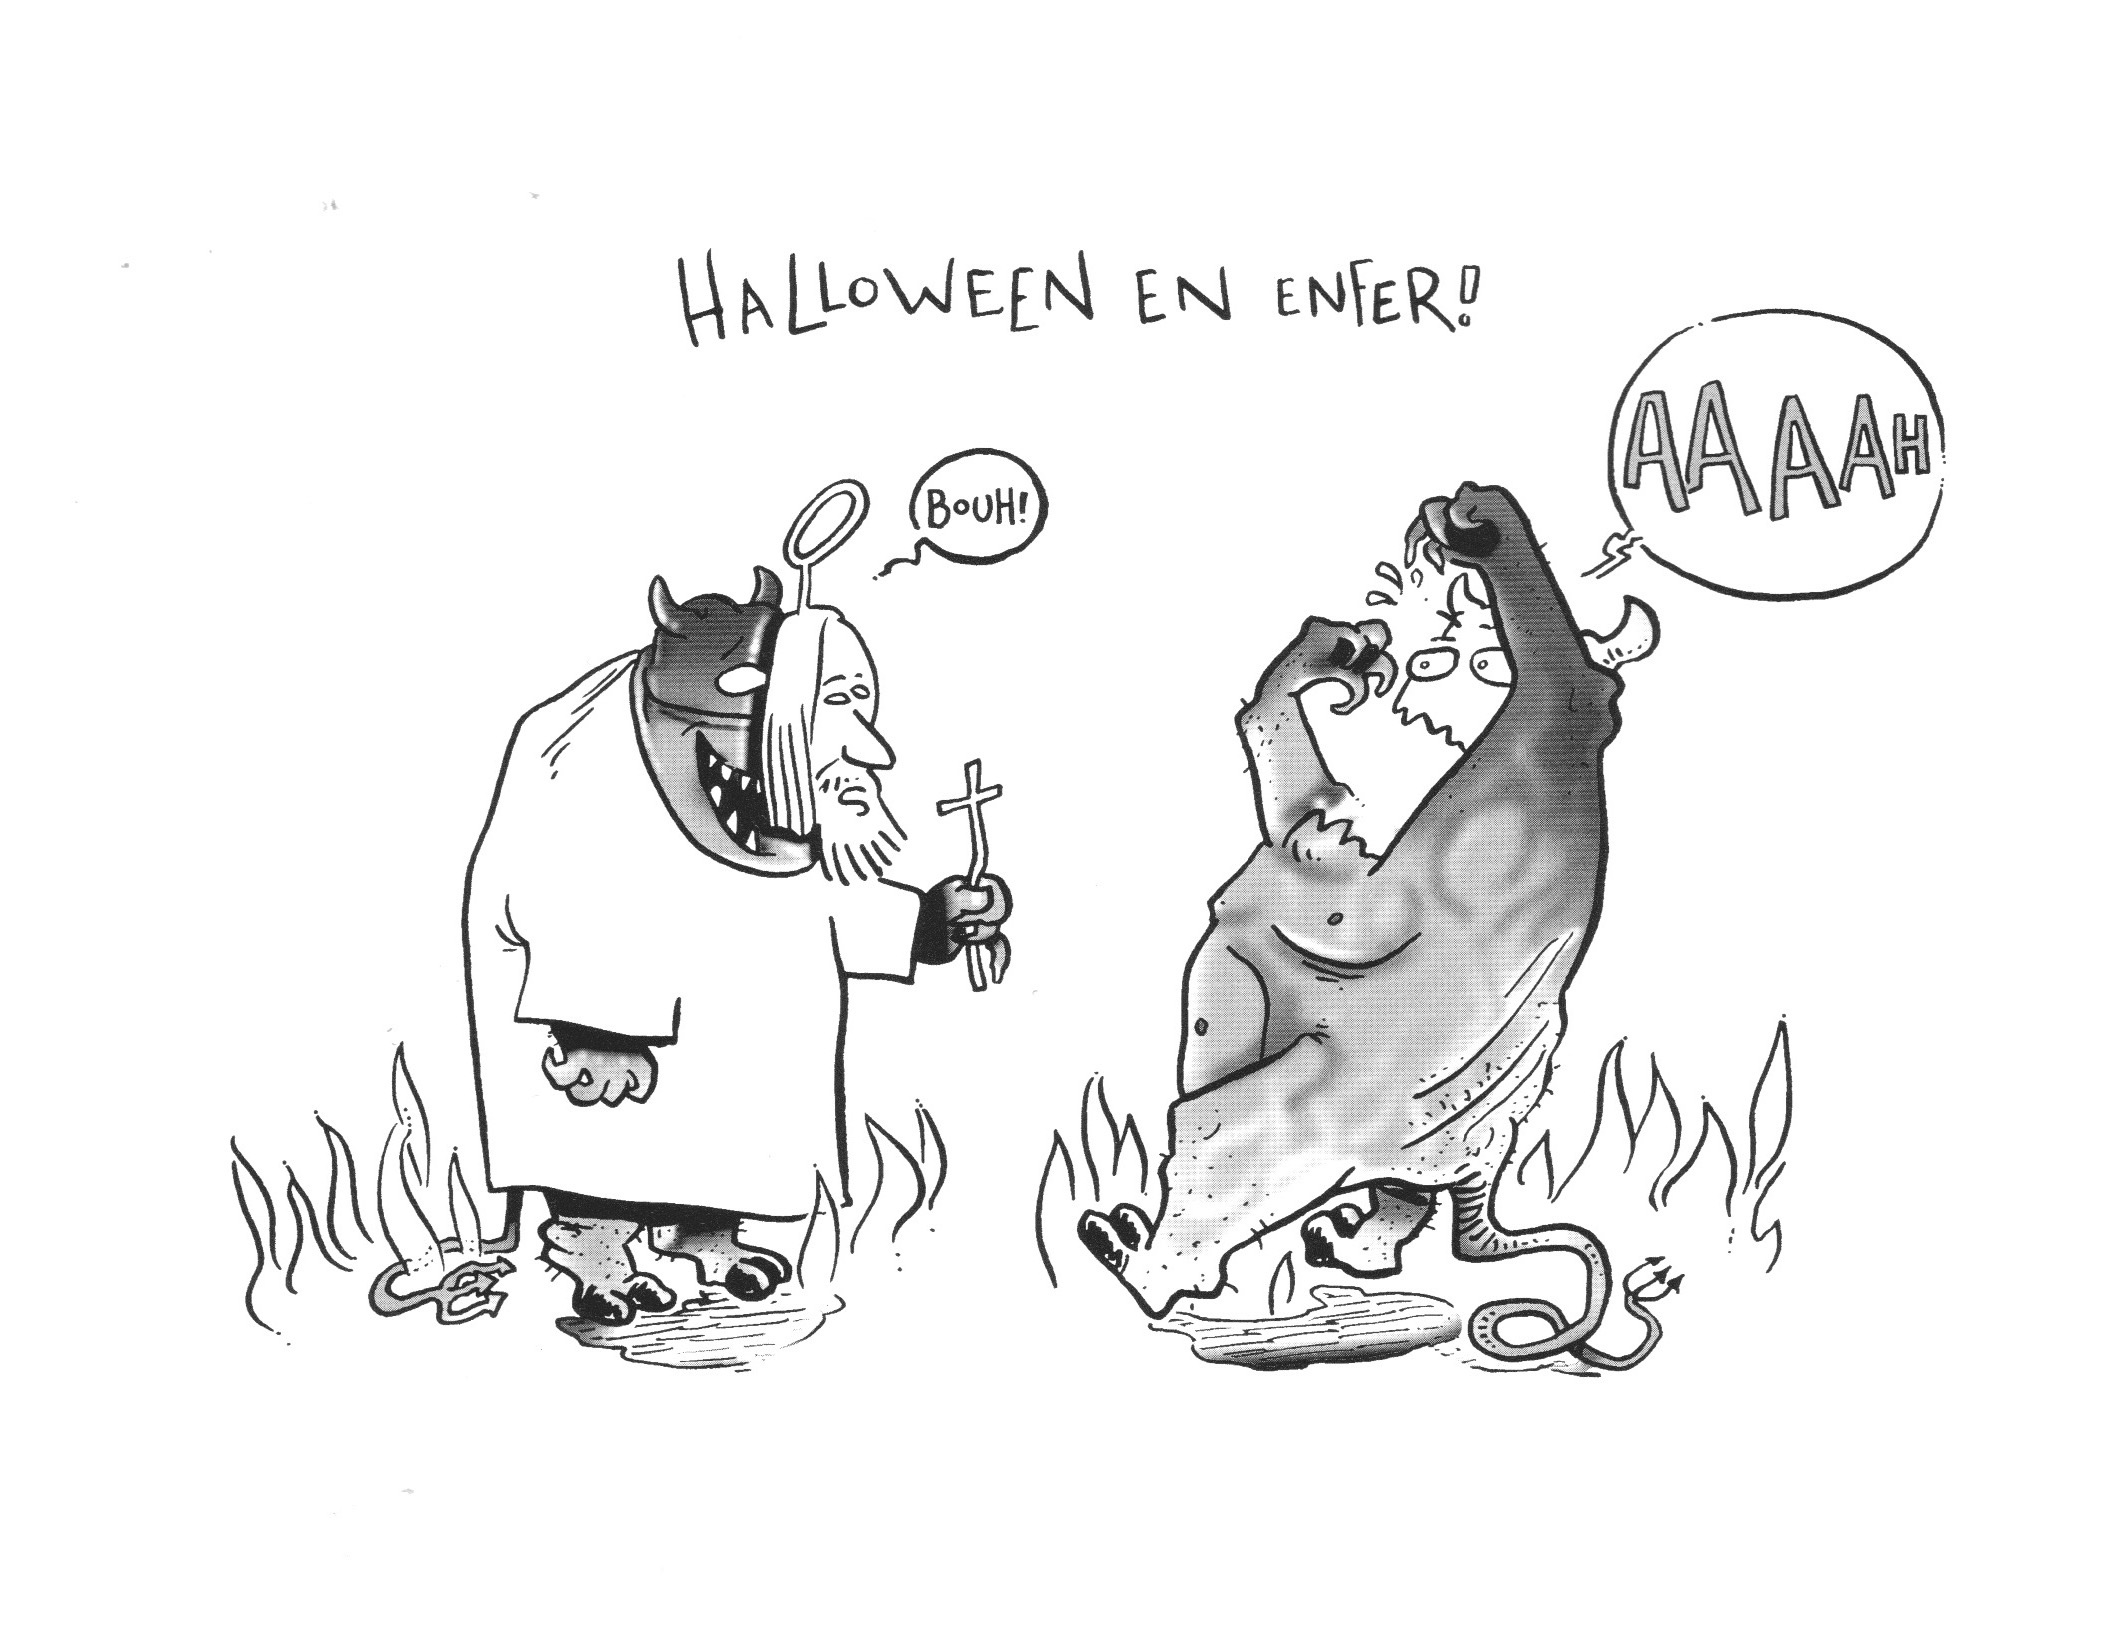 Hallowen.jpeg